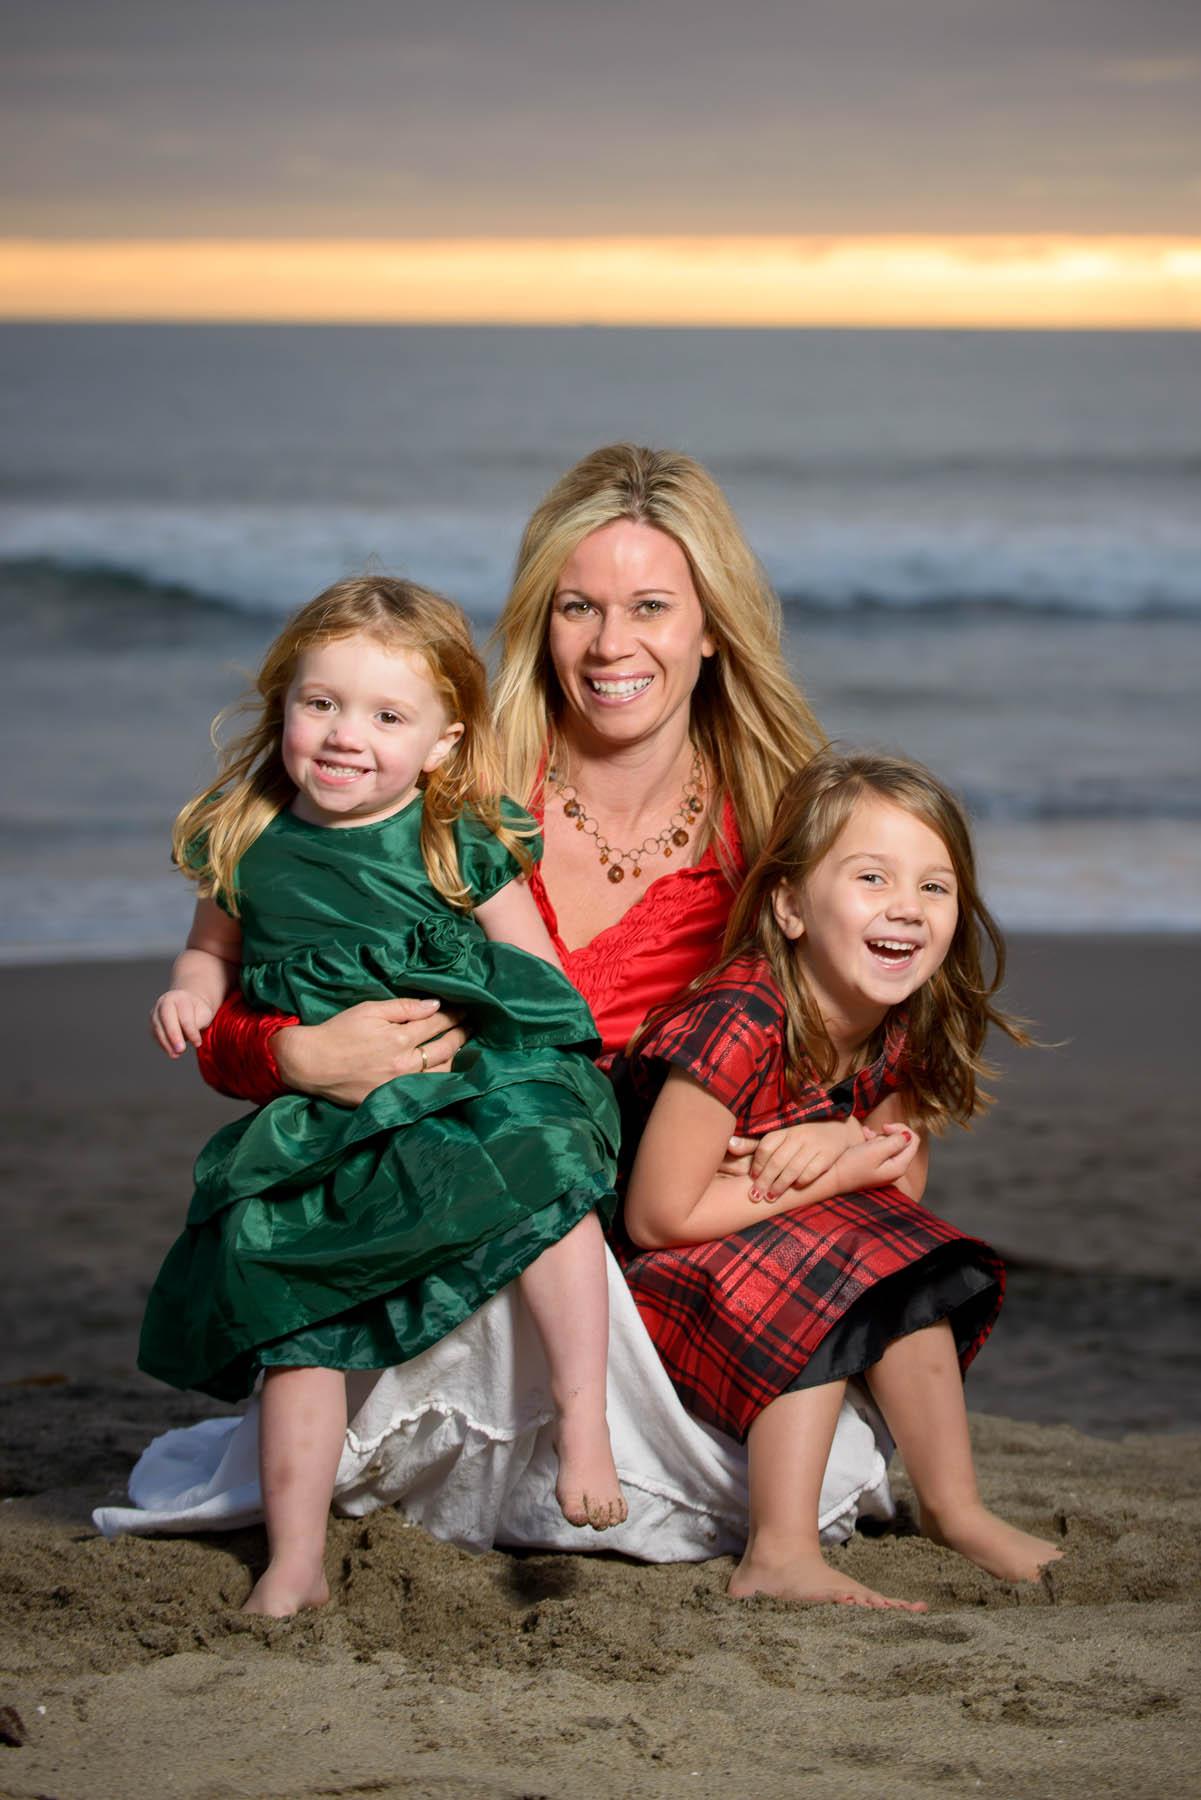 4189_d800_Monica_and_Girls_Rio_Del_Mar_Beach_Aptos_Family_Photography.jpg